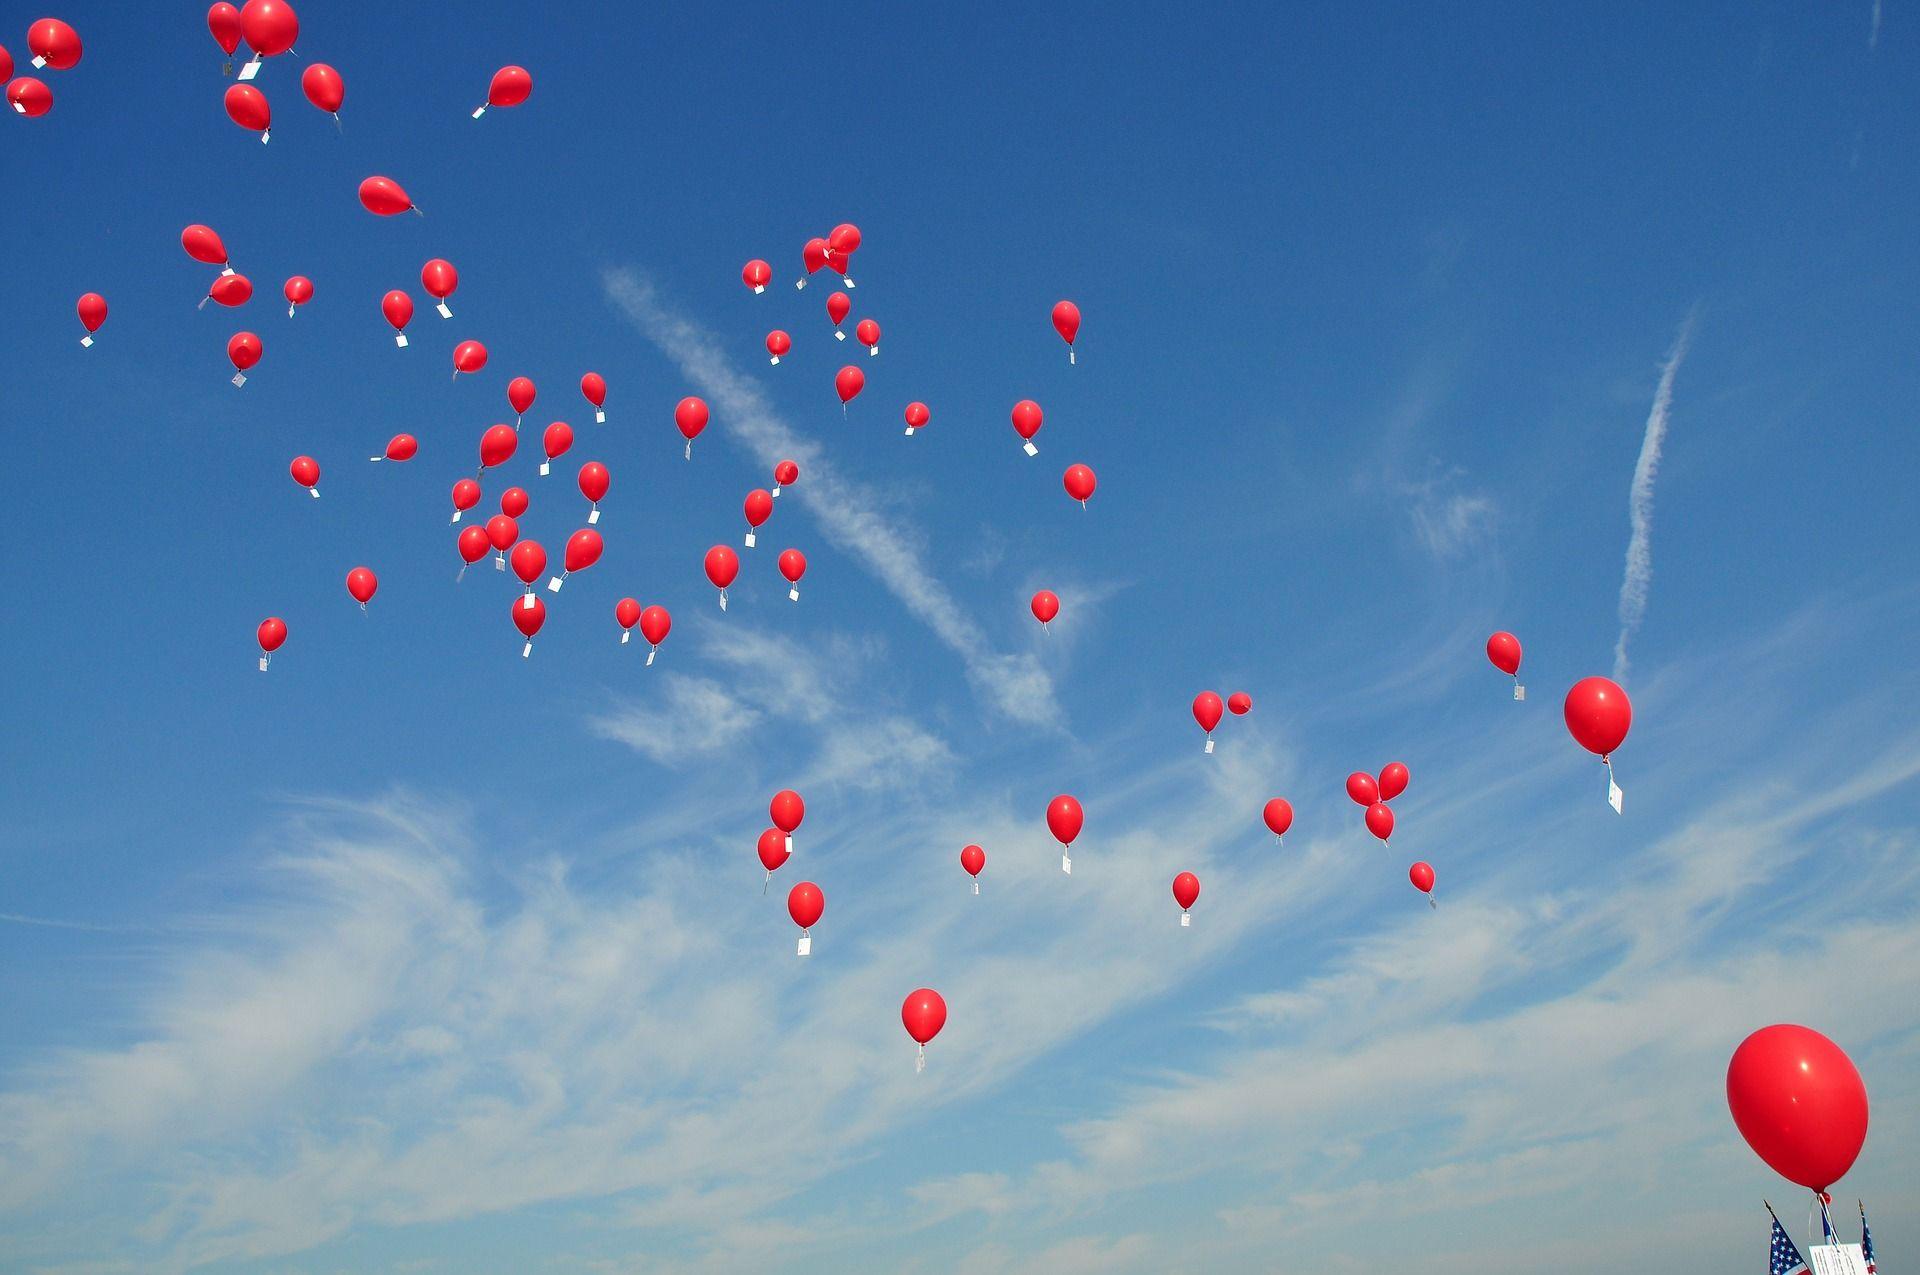 balloon release